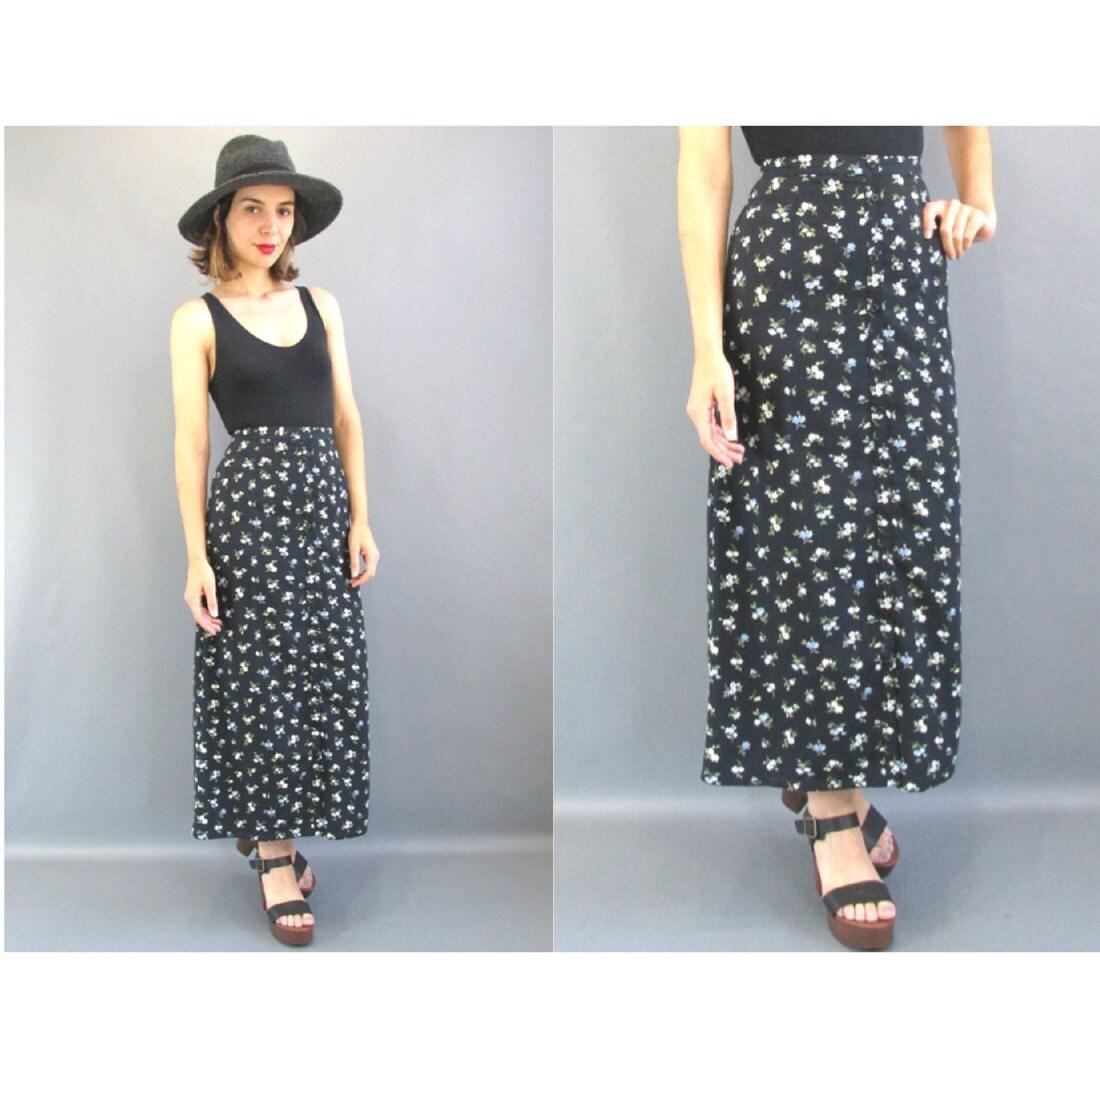 XS Long Black Floral Grunge Skirt XS Button Front Festival